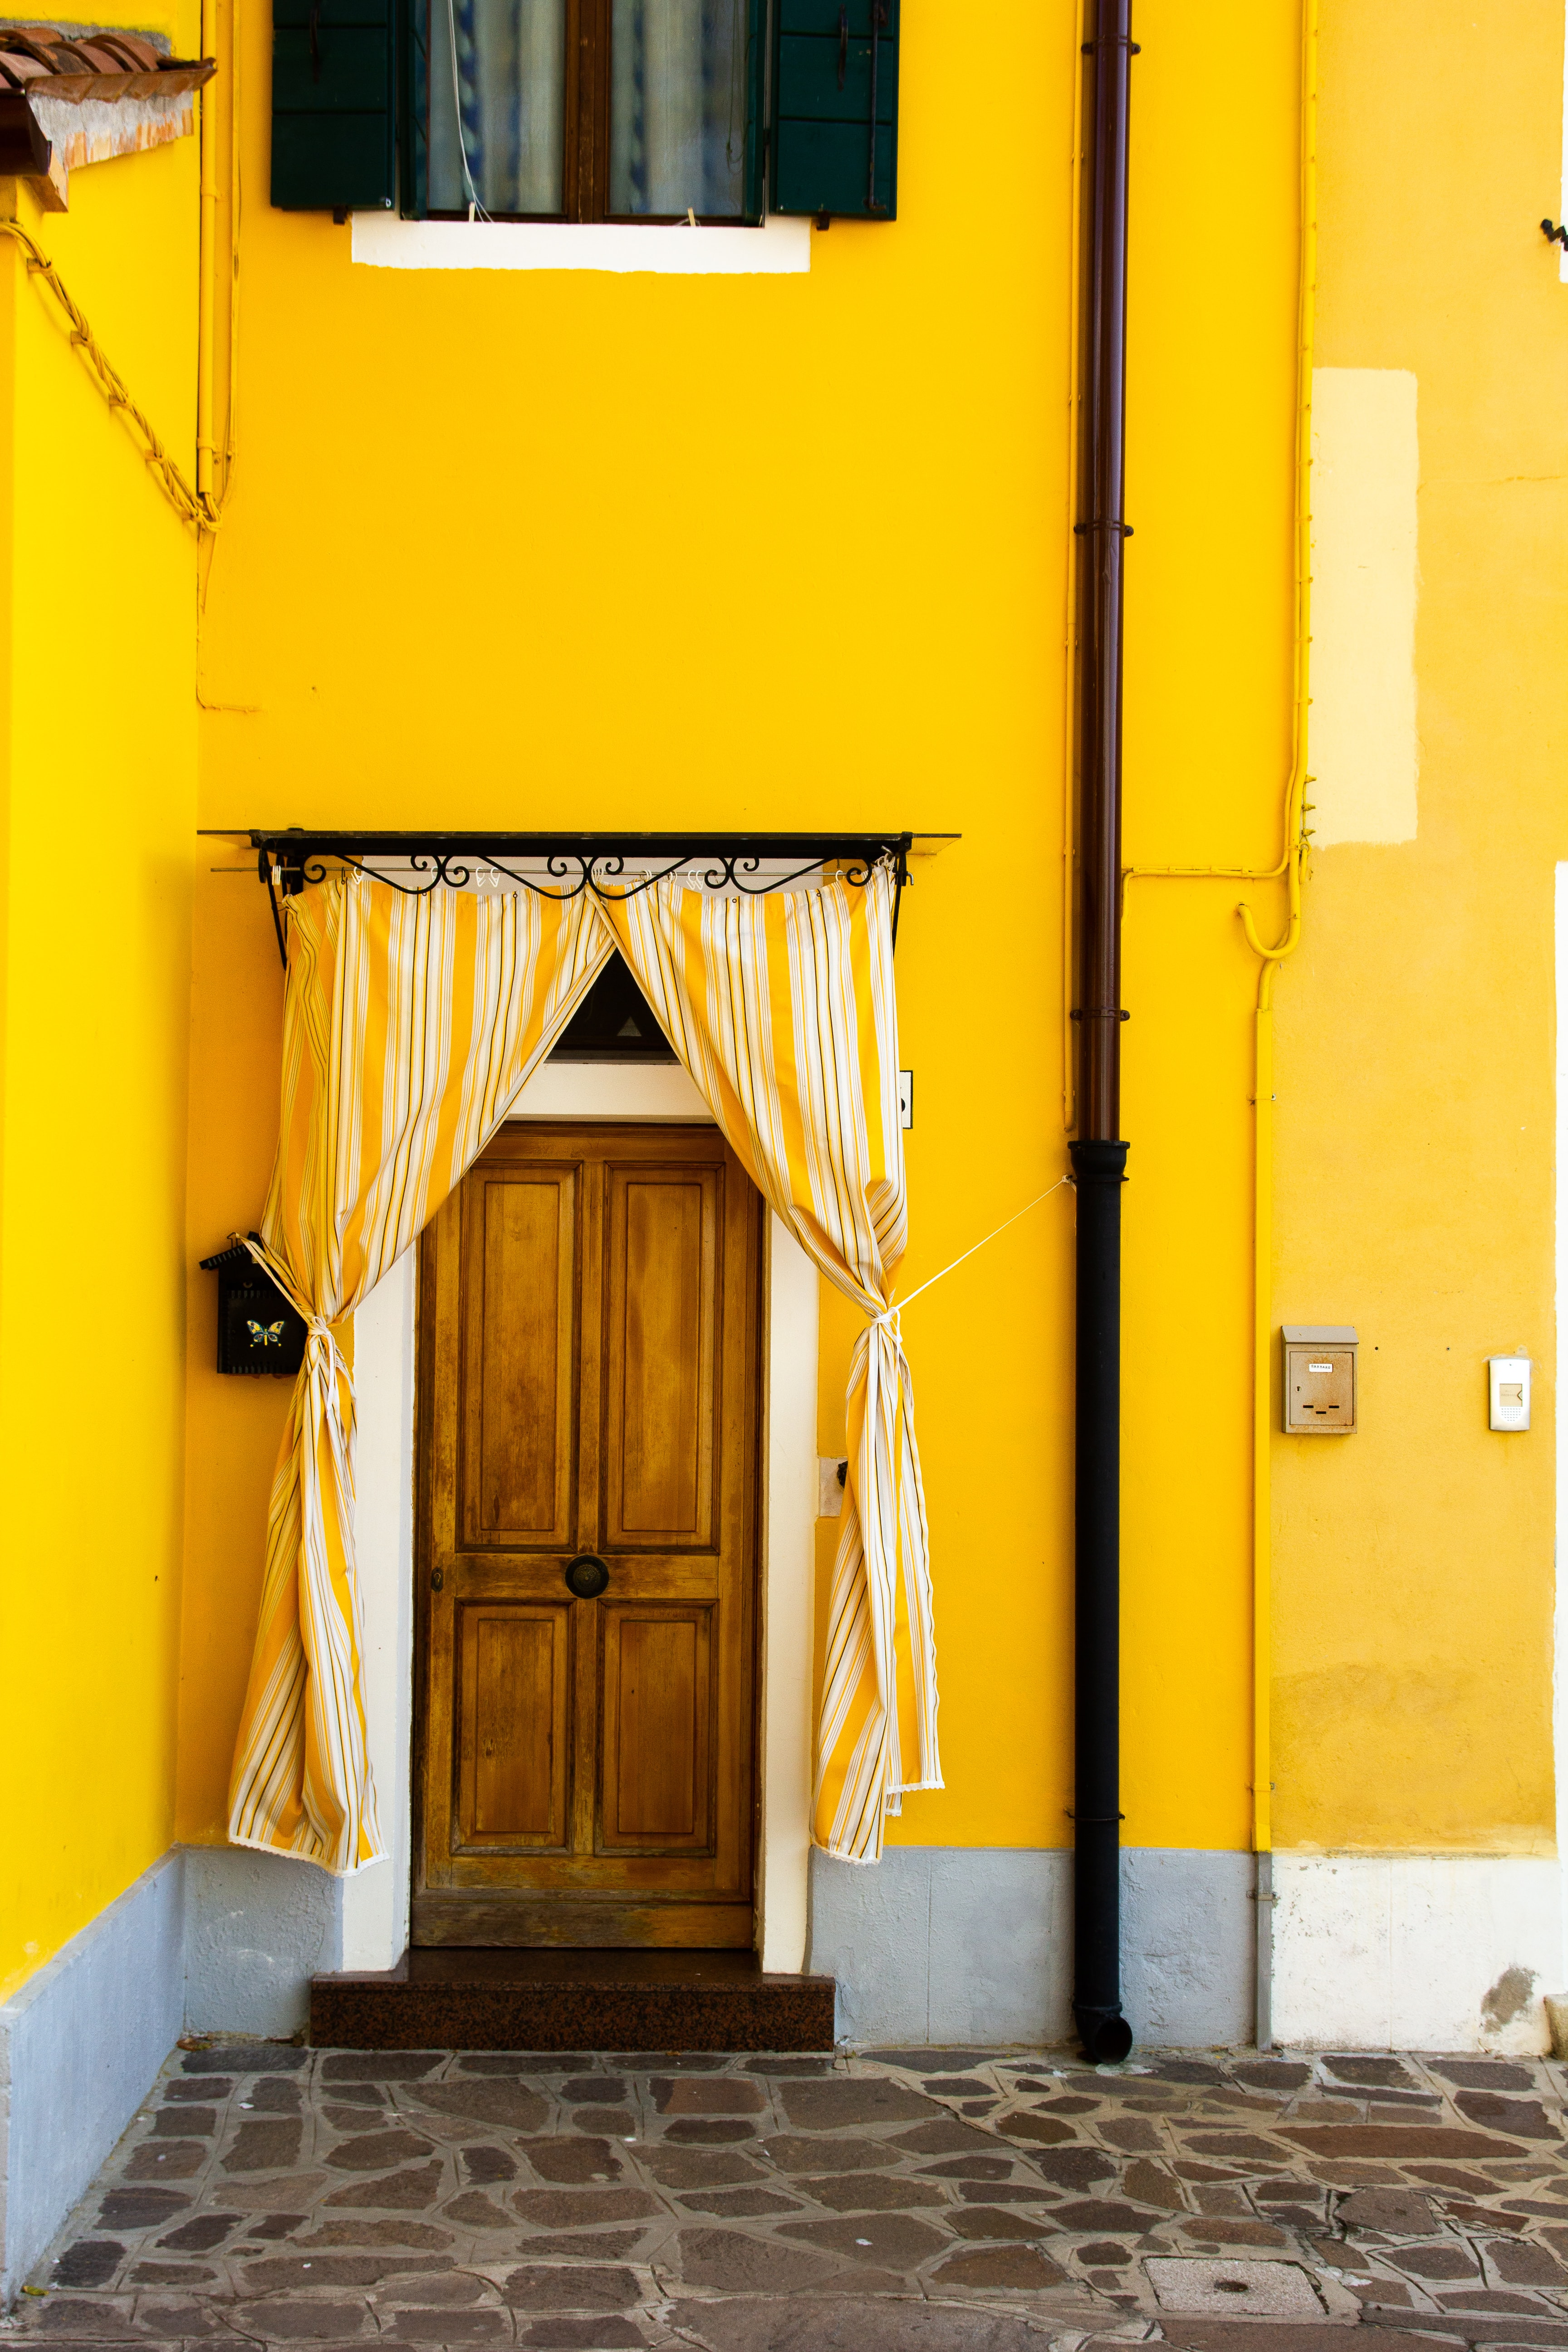 yellow paint house with brown wooden door